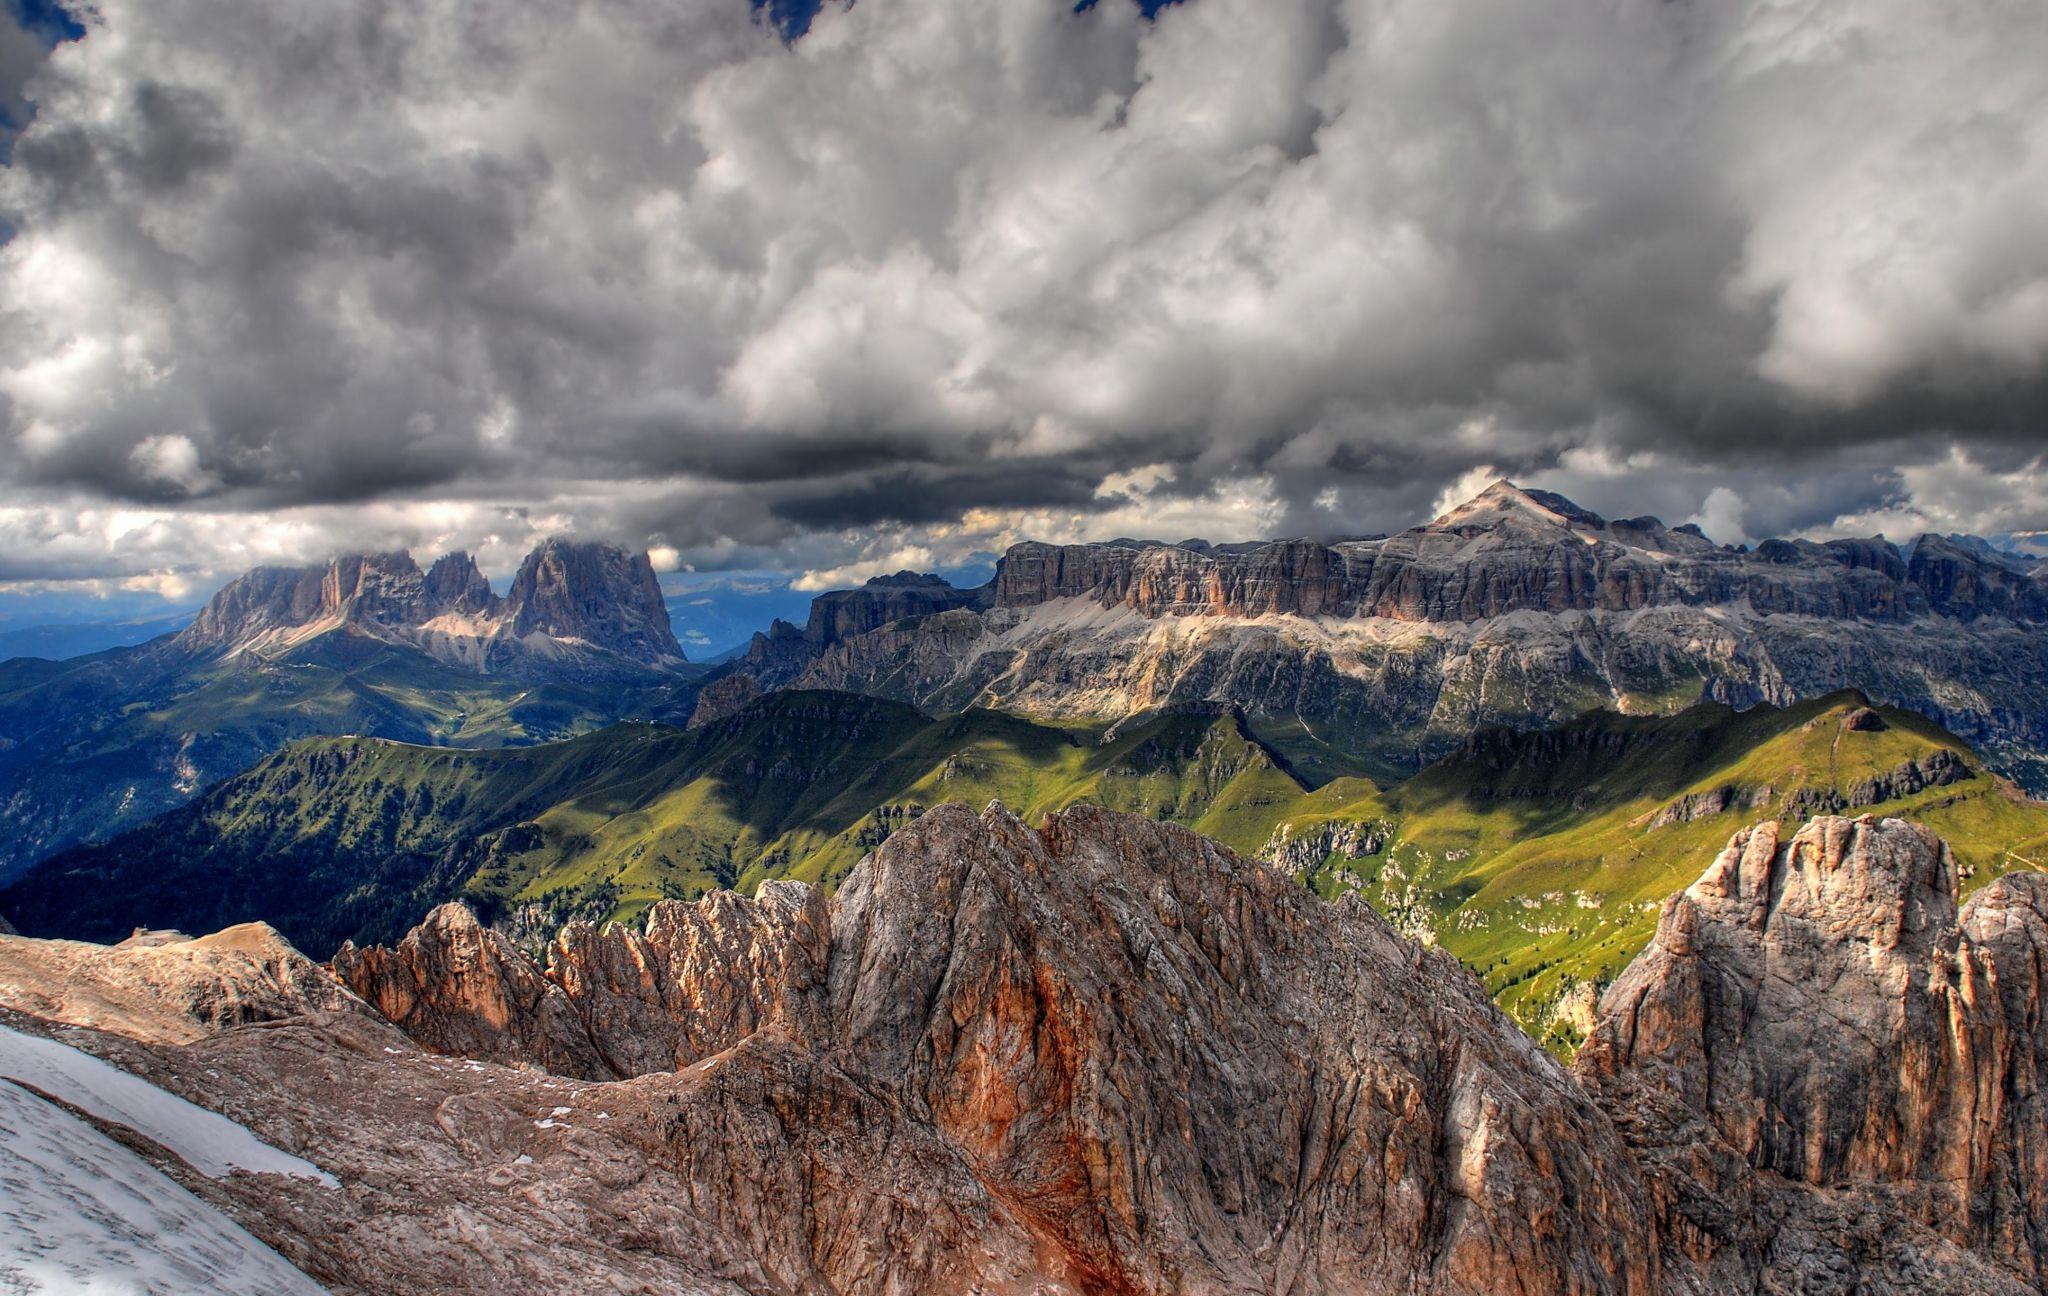 Serauta Punta Rocca - Marmolada, Italy